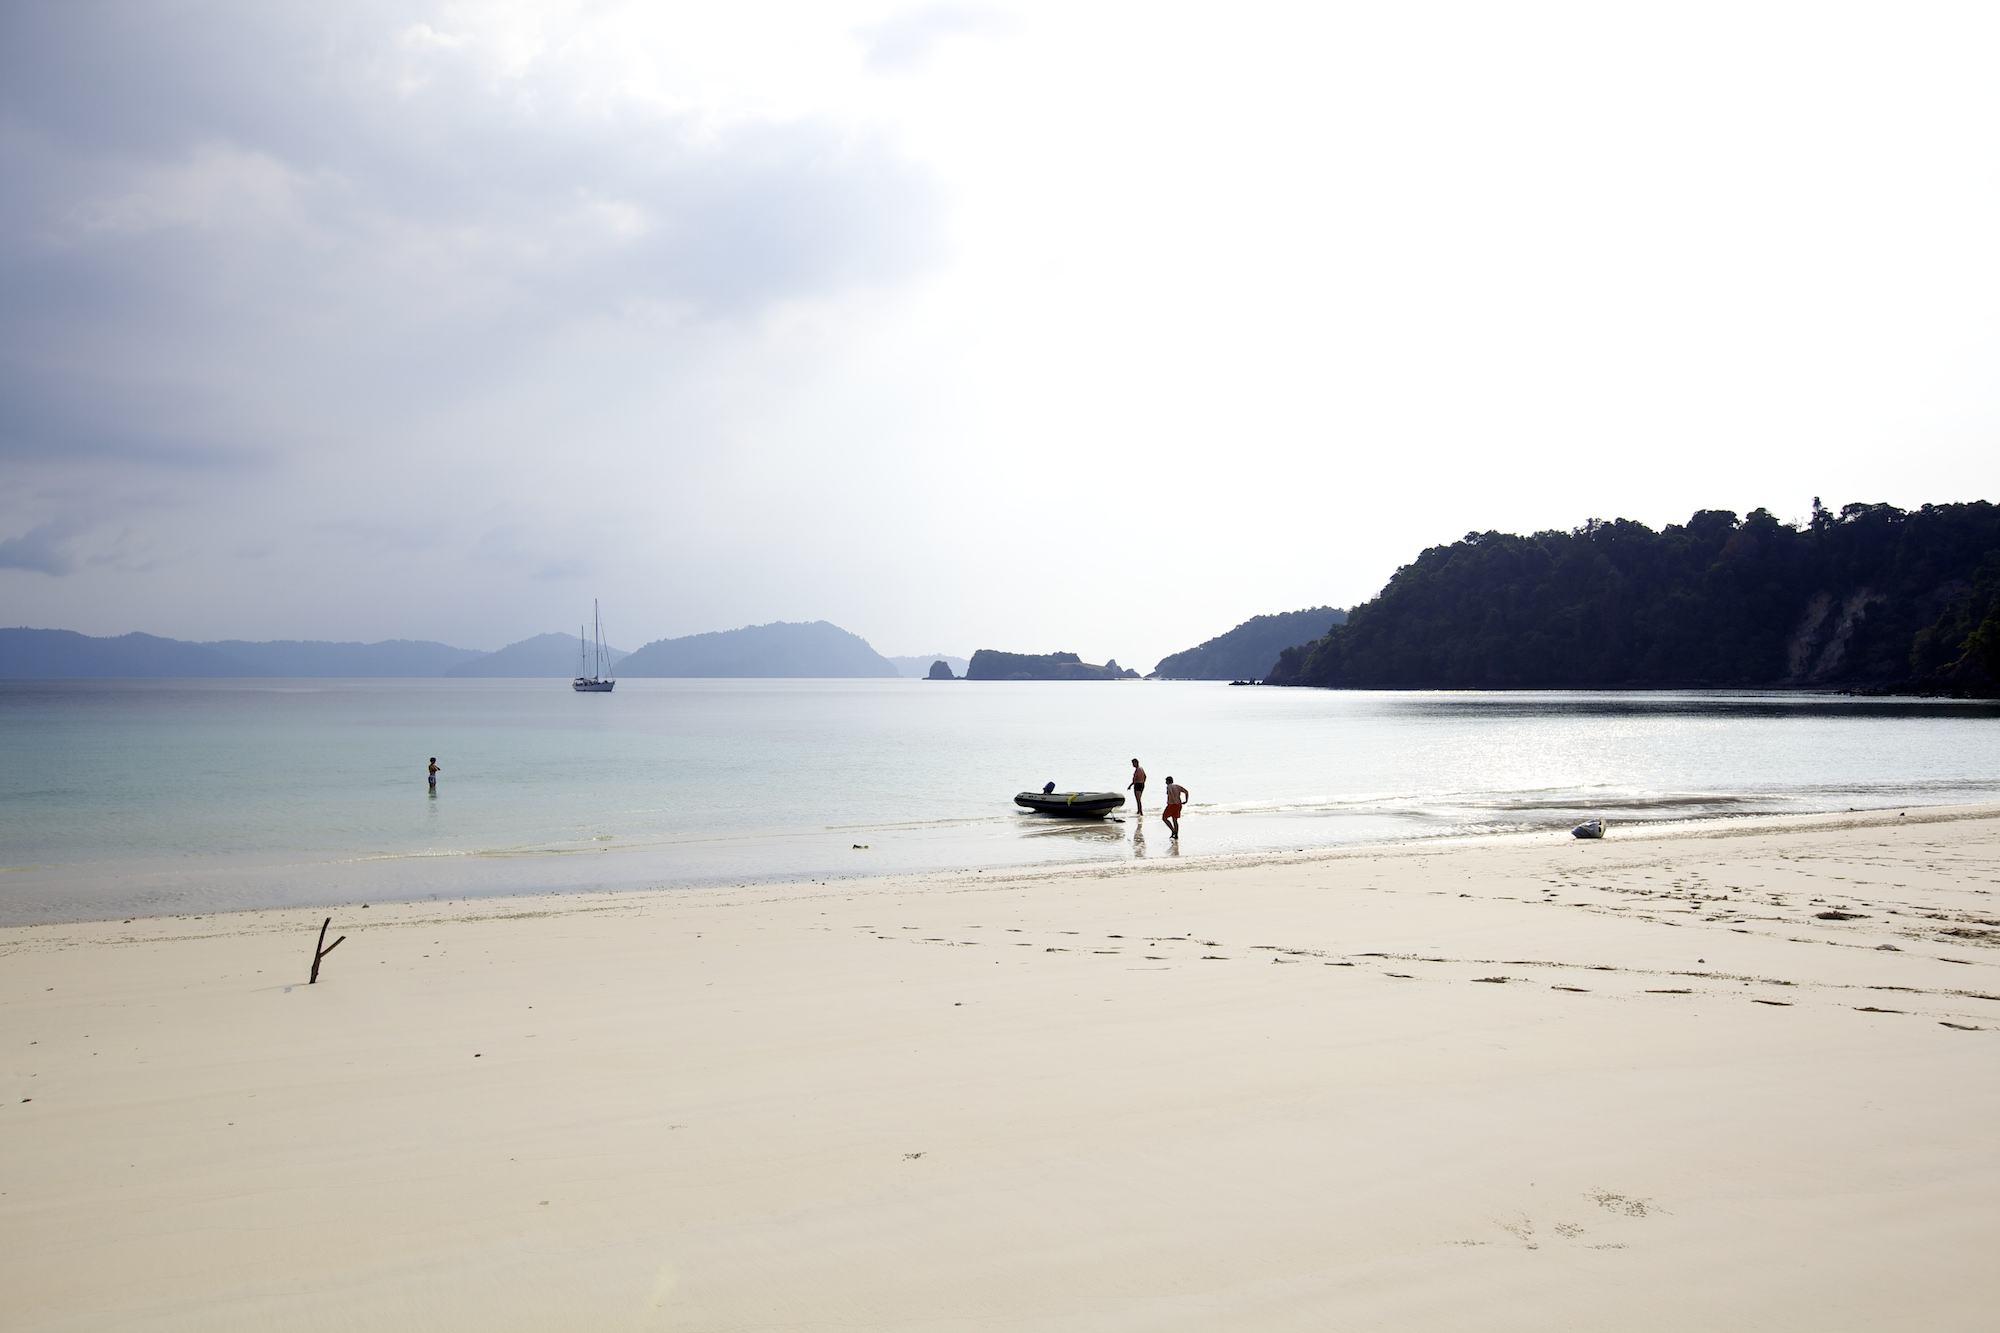 BB_Mergui_empty_beaches_Islands.jpg